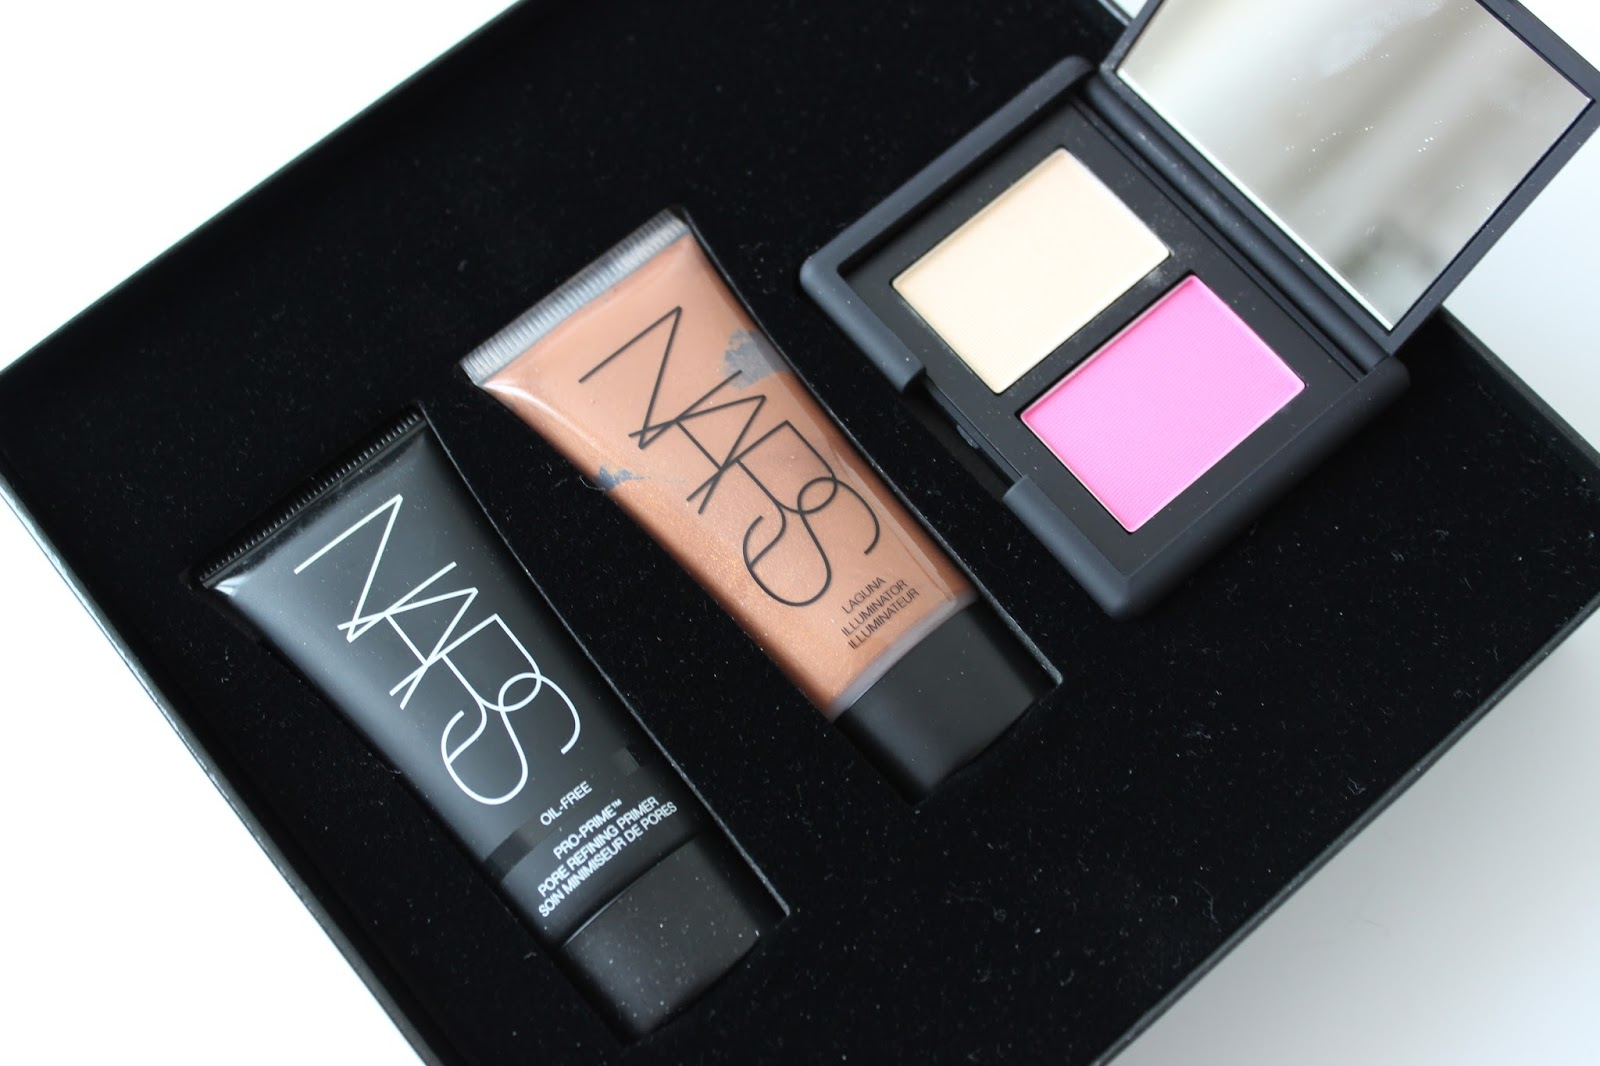 IMATS haul NARS gift set